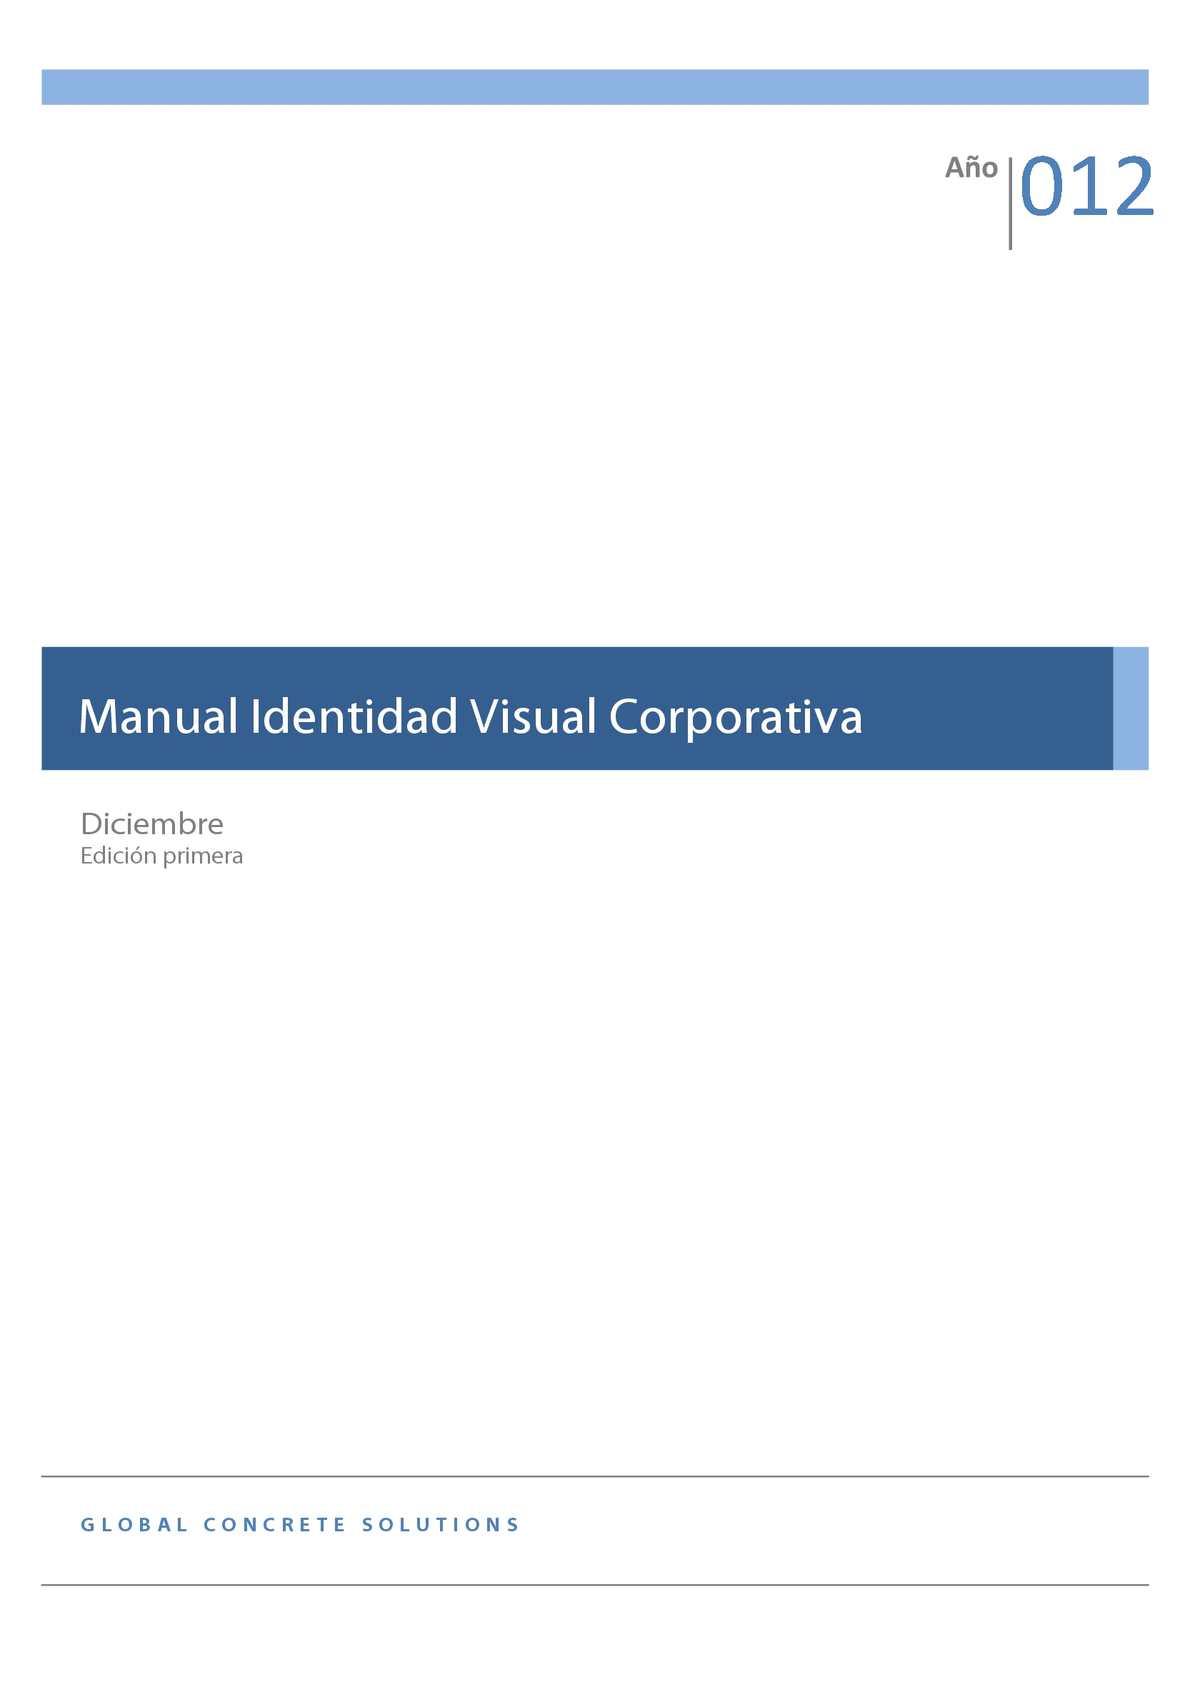 Calaméo - Manual Identidad Visual Corporativa GCS